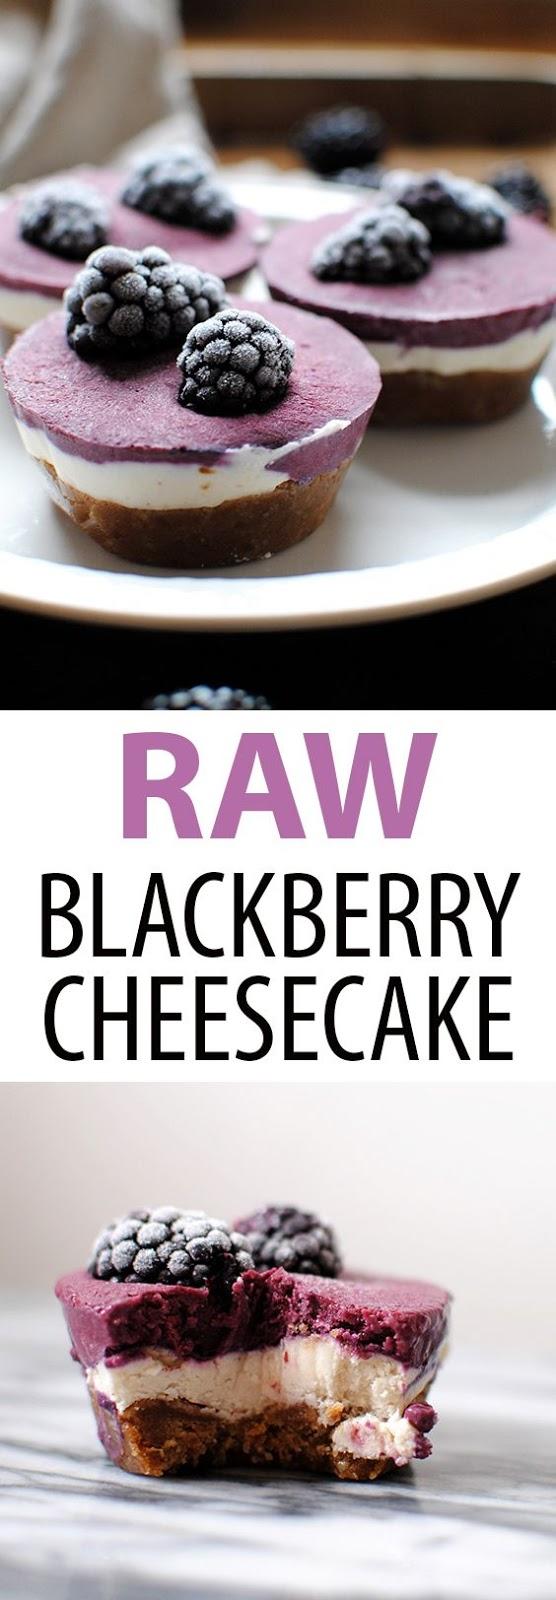 Raw Blackberry Cheesecakes